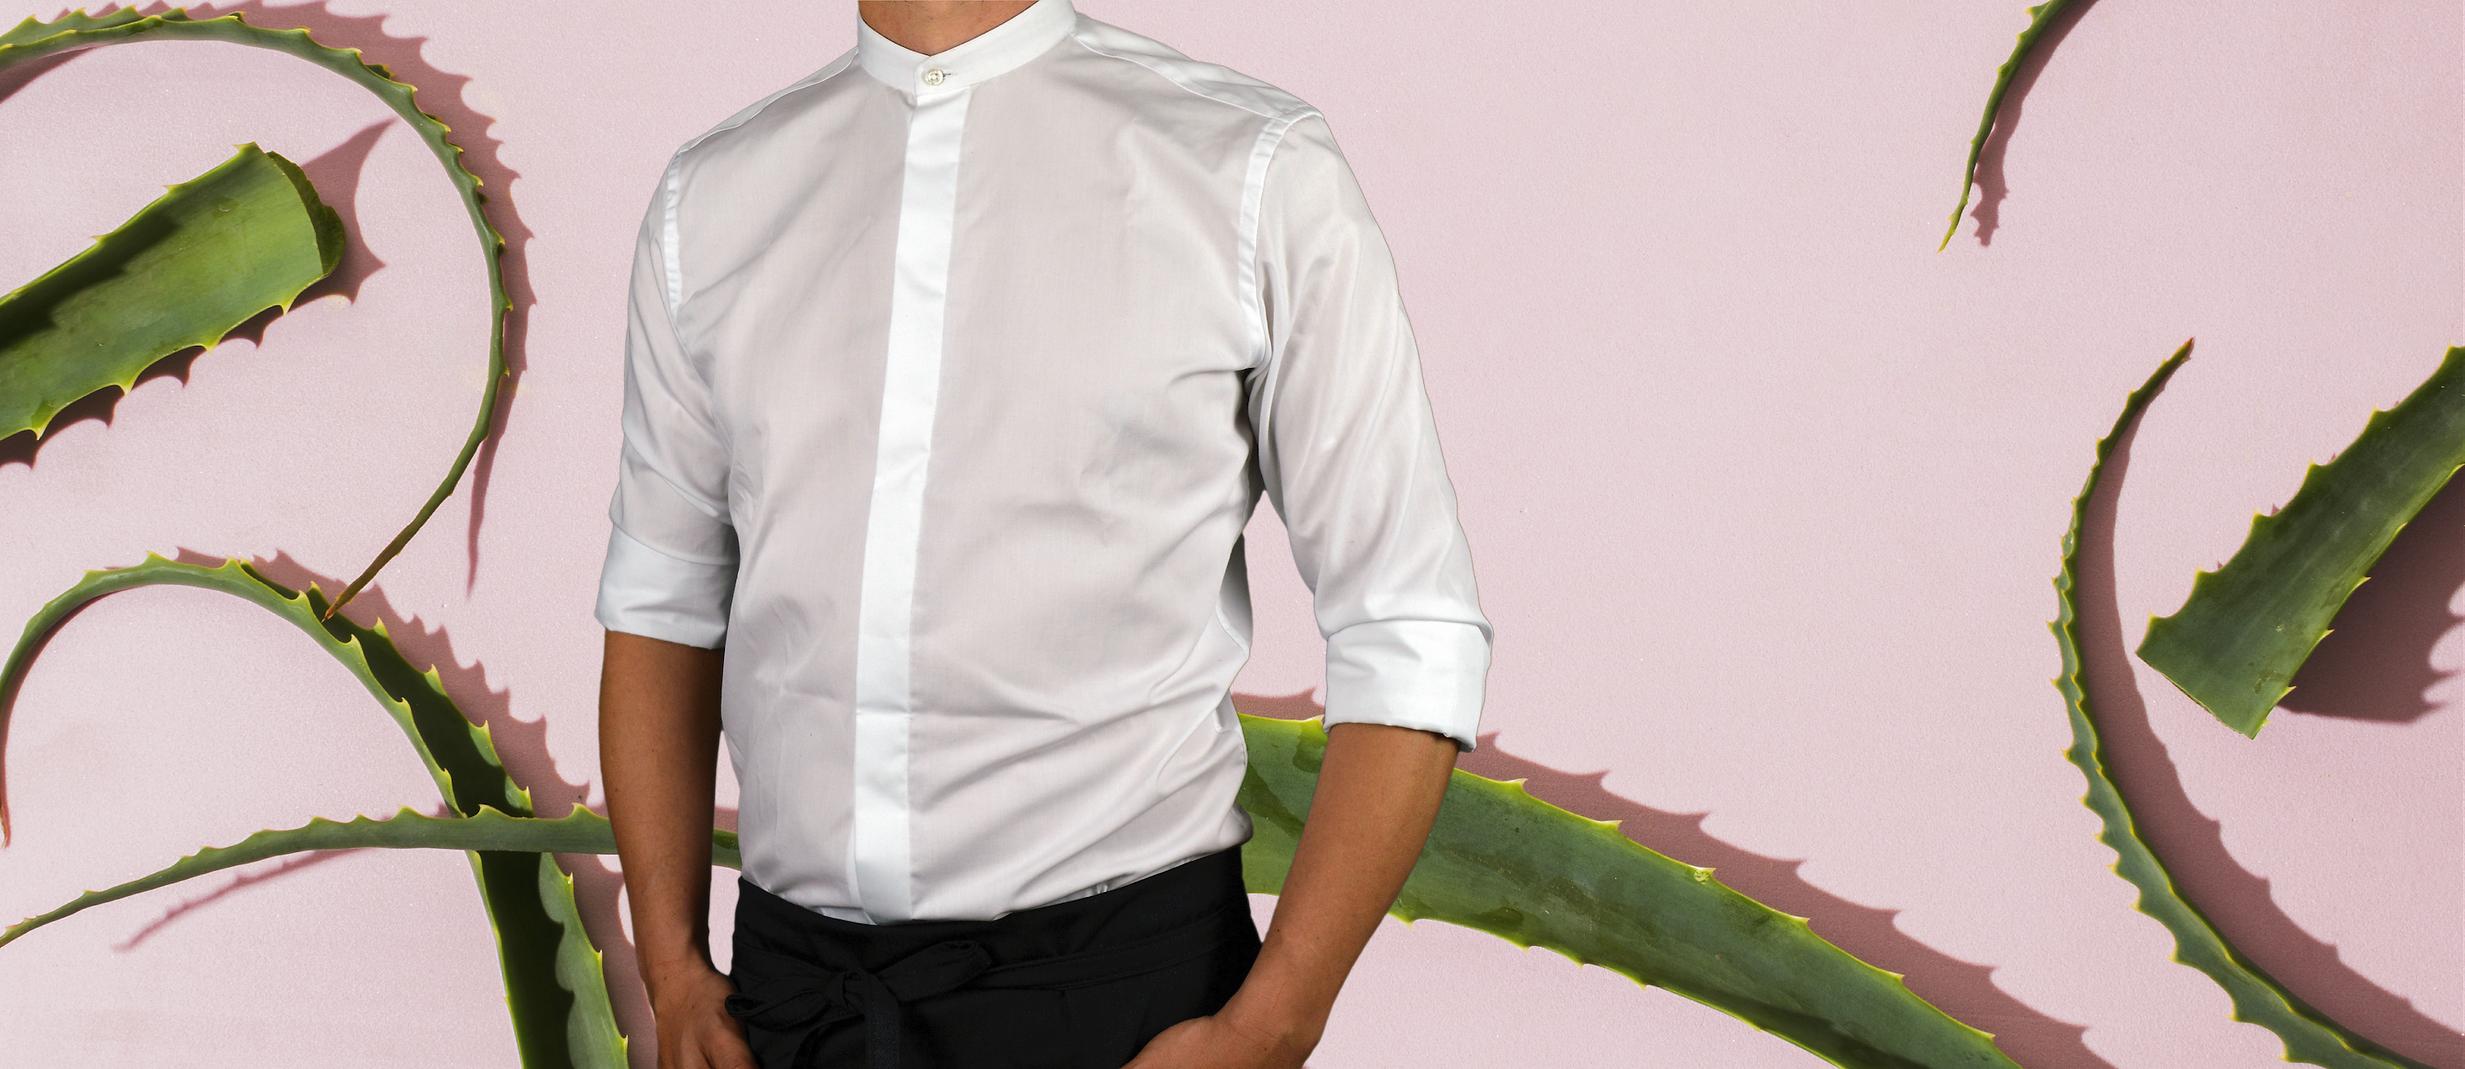 shirt-02.png